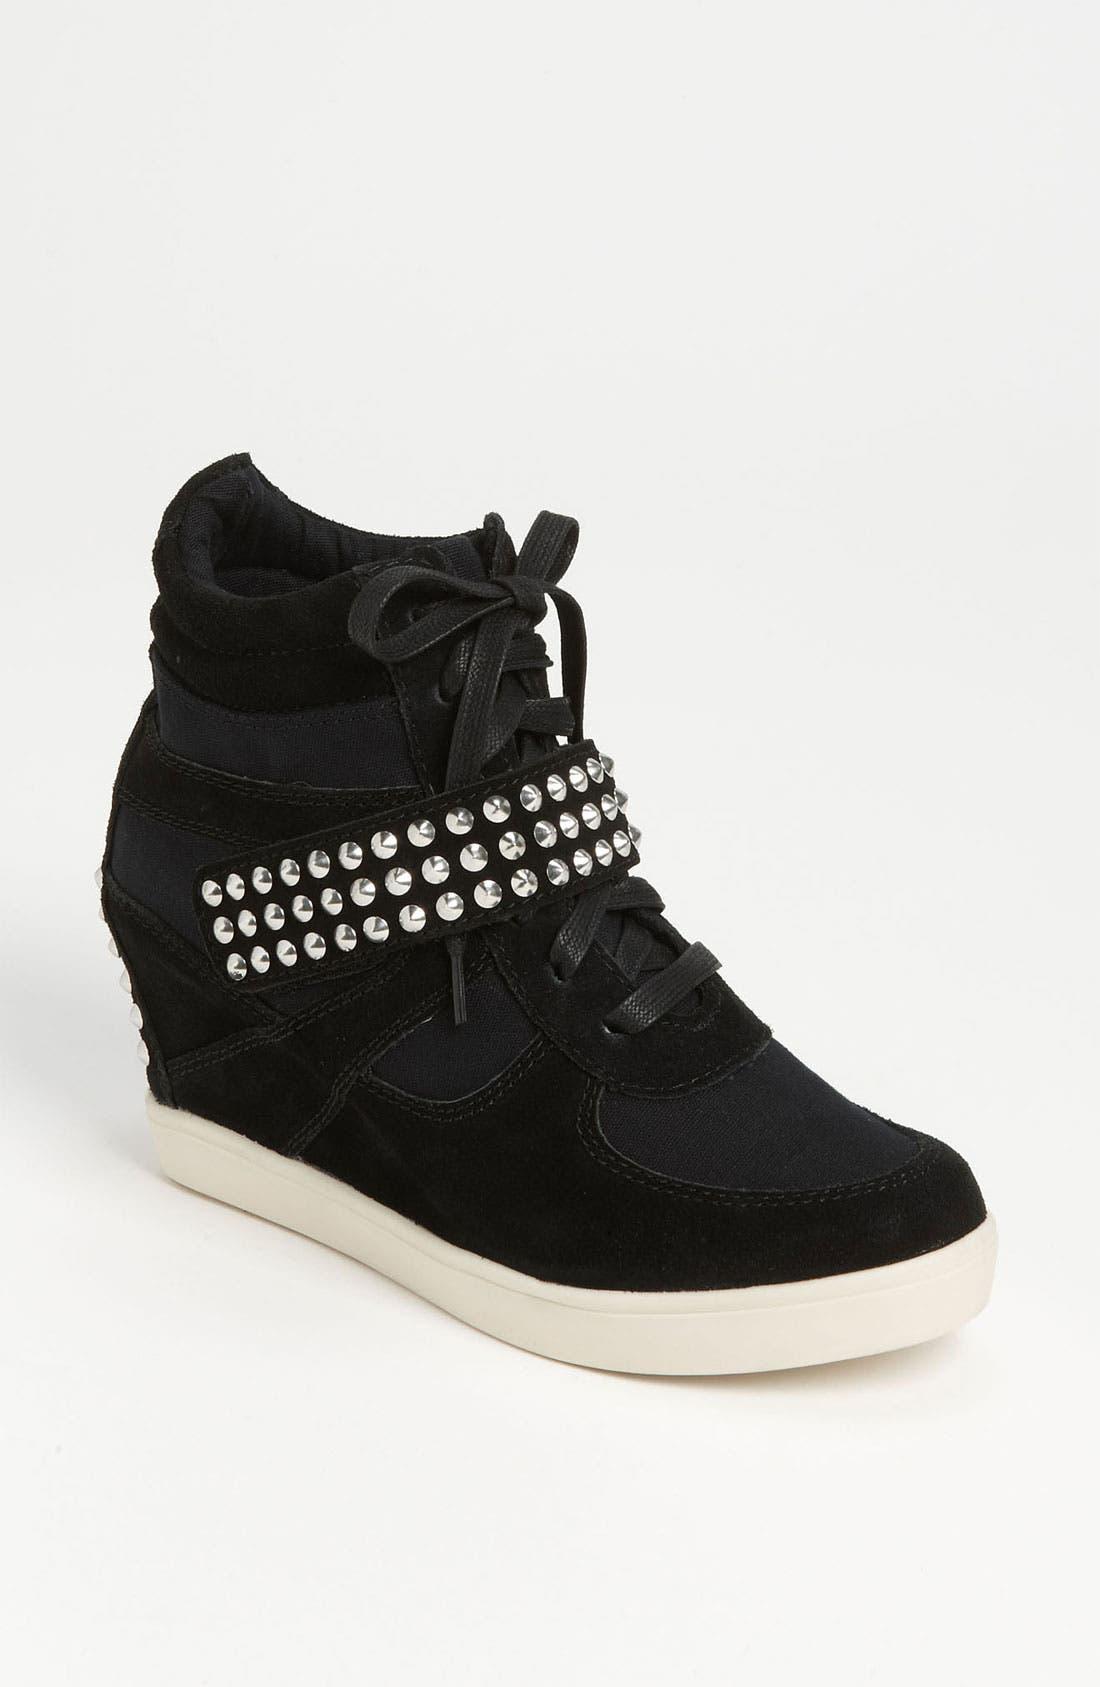 Alternate Image 1 Selected - Steve Madden 'Olympa-S' Wedge Sneaker